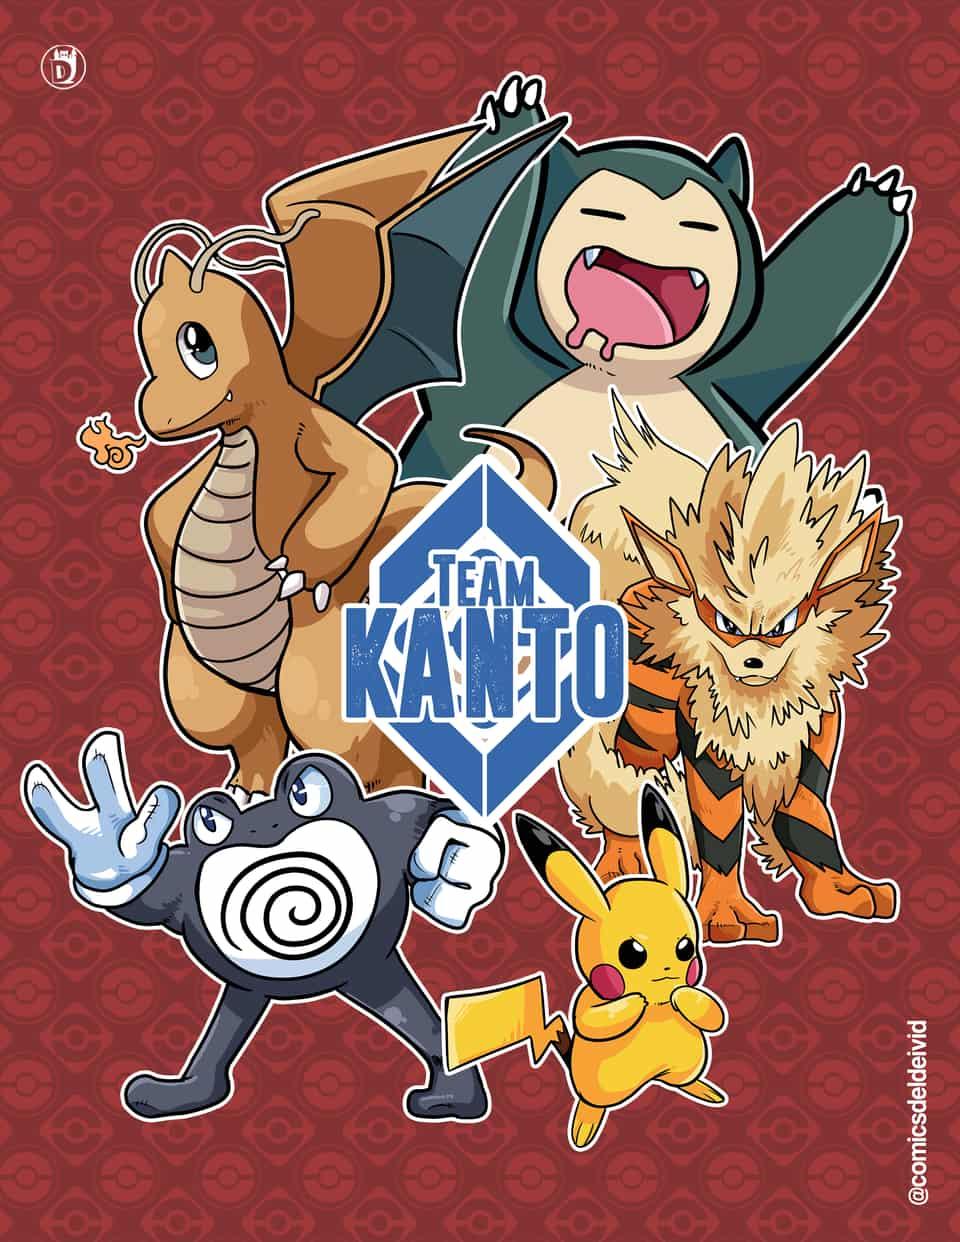 Kanto Team Red Illust of DCastlee poster ピカチュウ kanto カビゴン rojo pokemon ニョロボン ウィンディ カイリュー